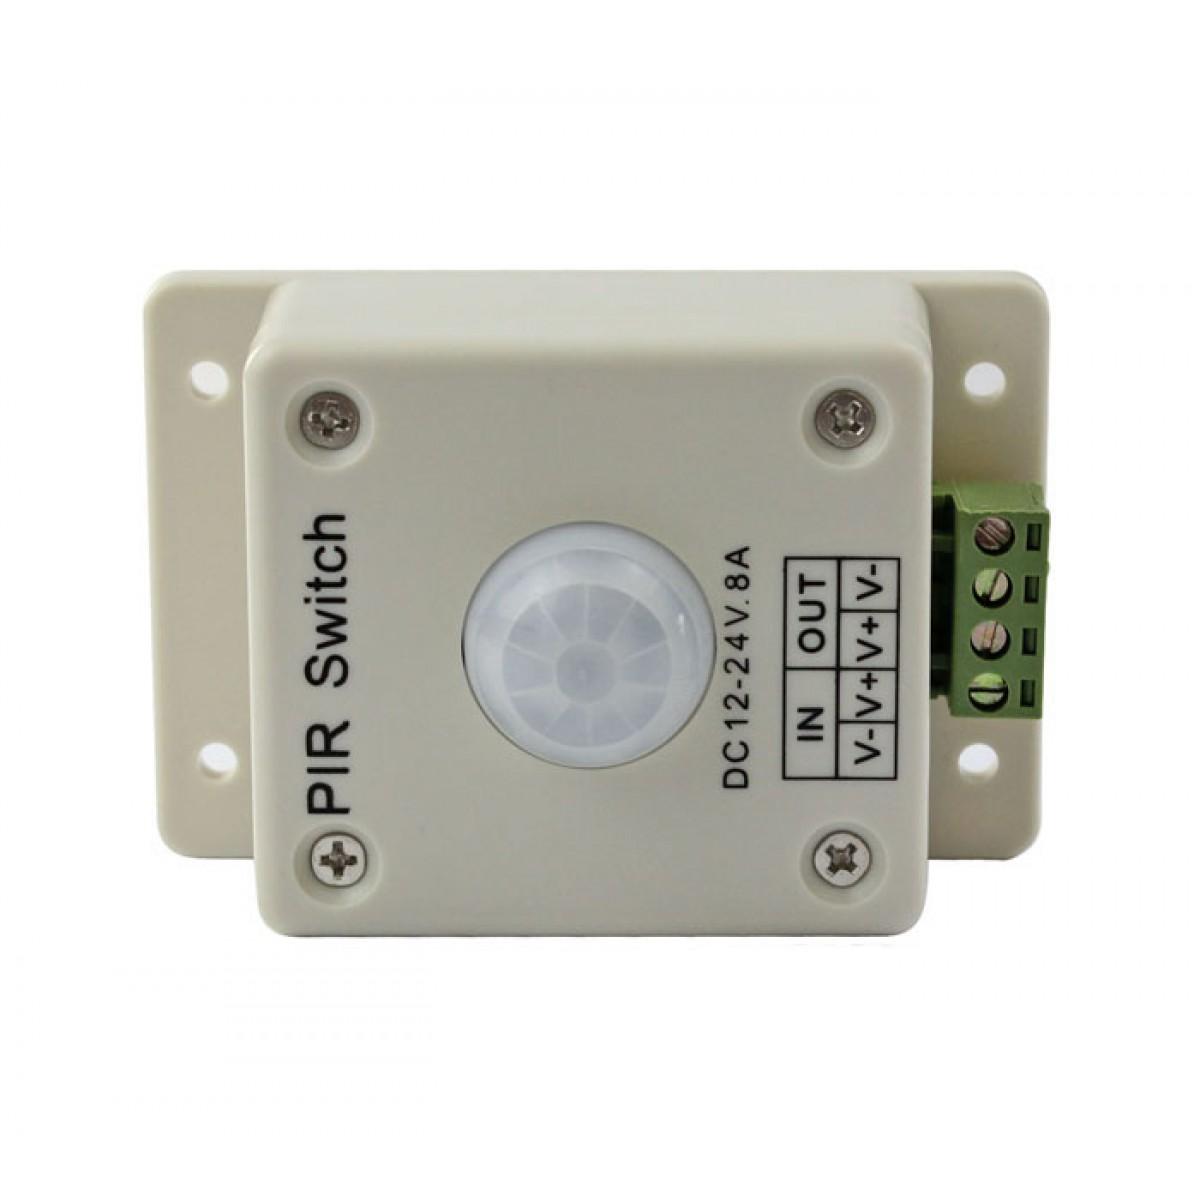 Soroko Trading Ltd Smart Gadgets Electronics Spy Hidden Light Switch With Pir Sensor Led Security Motion Product Description